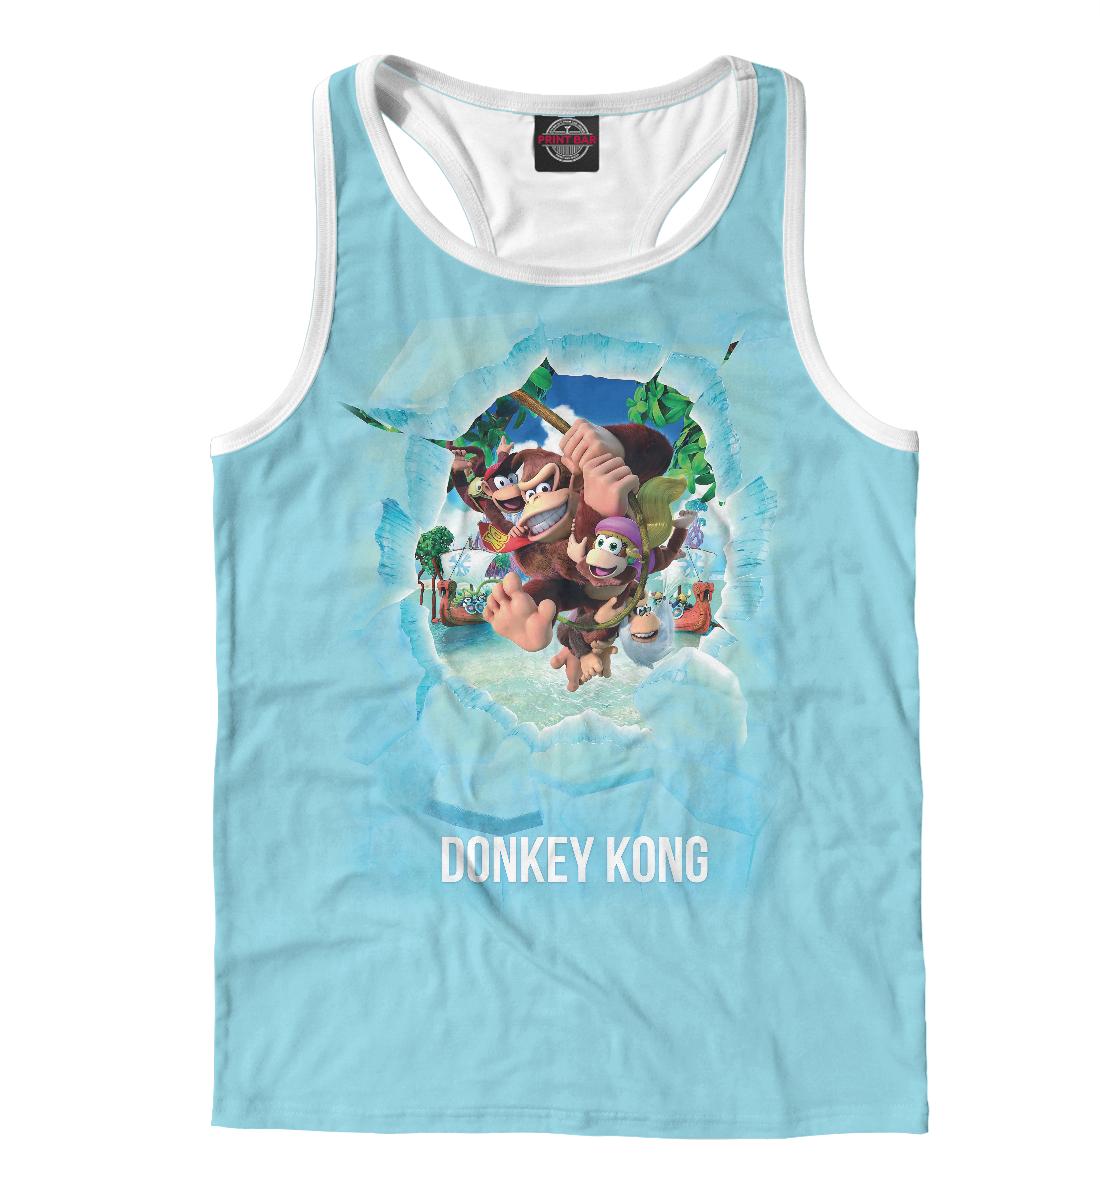 Купить Donkey Kong, Printbar, Майки борцовки, RPG-786965-mayb-2